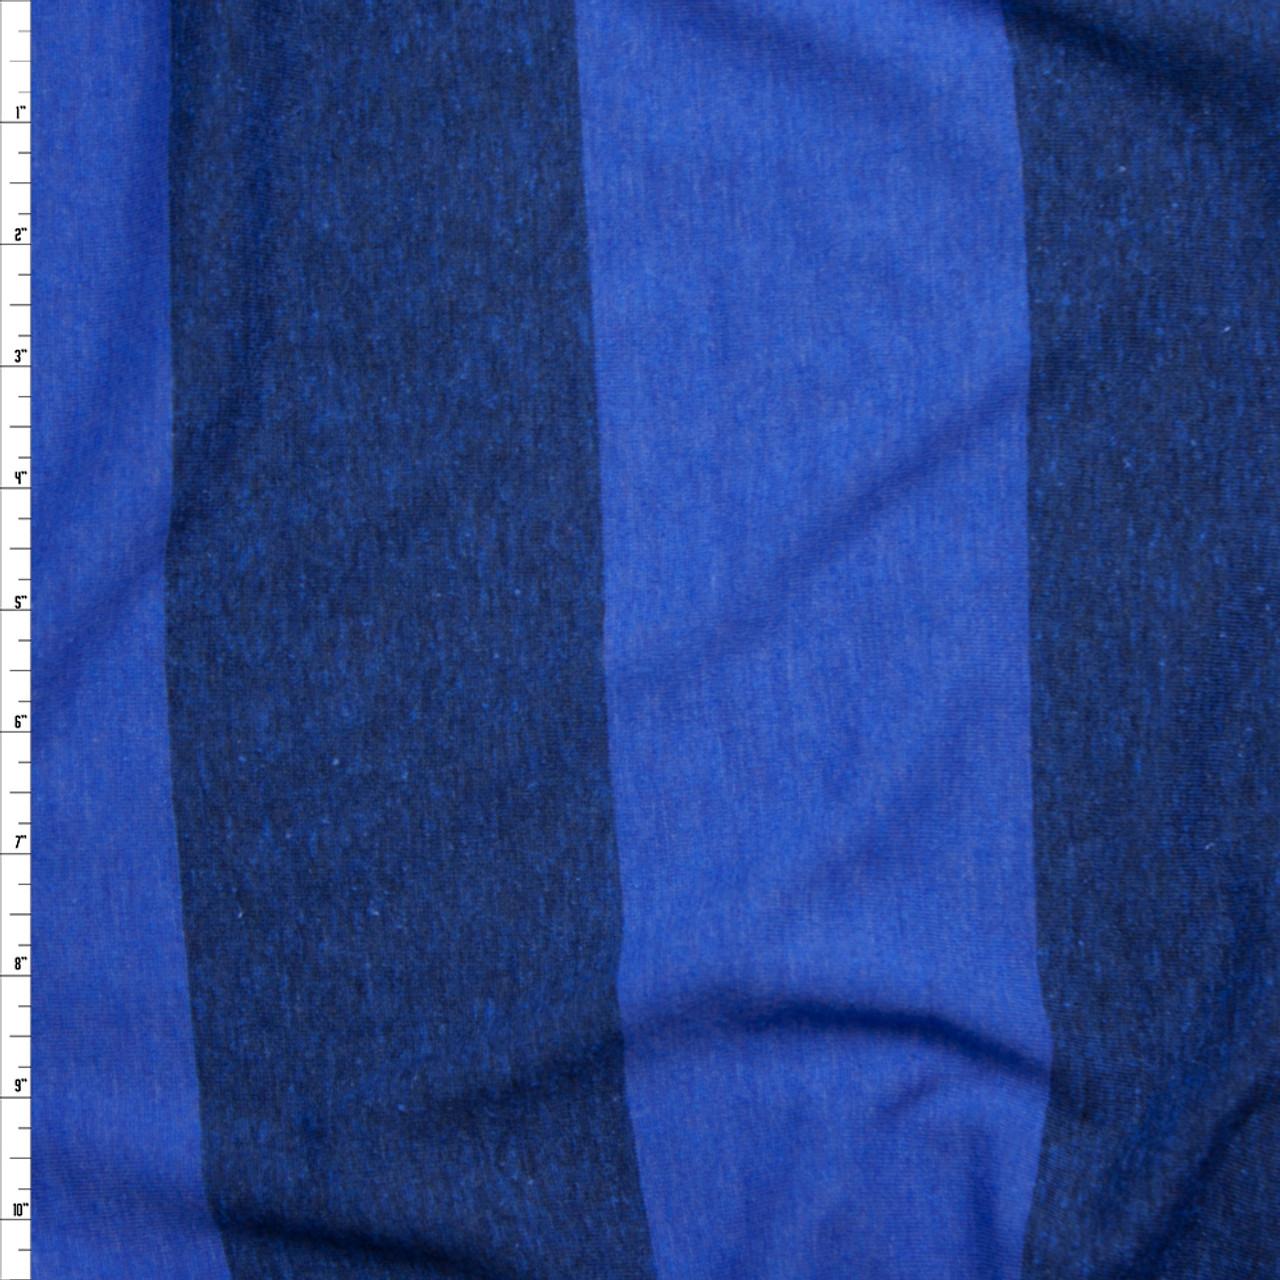 c4fe9bd05cc Cali Fabrics Bright Blue Wide Stripe Lightweight Jersey Knit Fabric ...